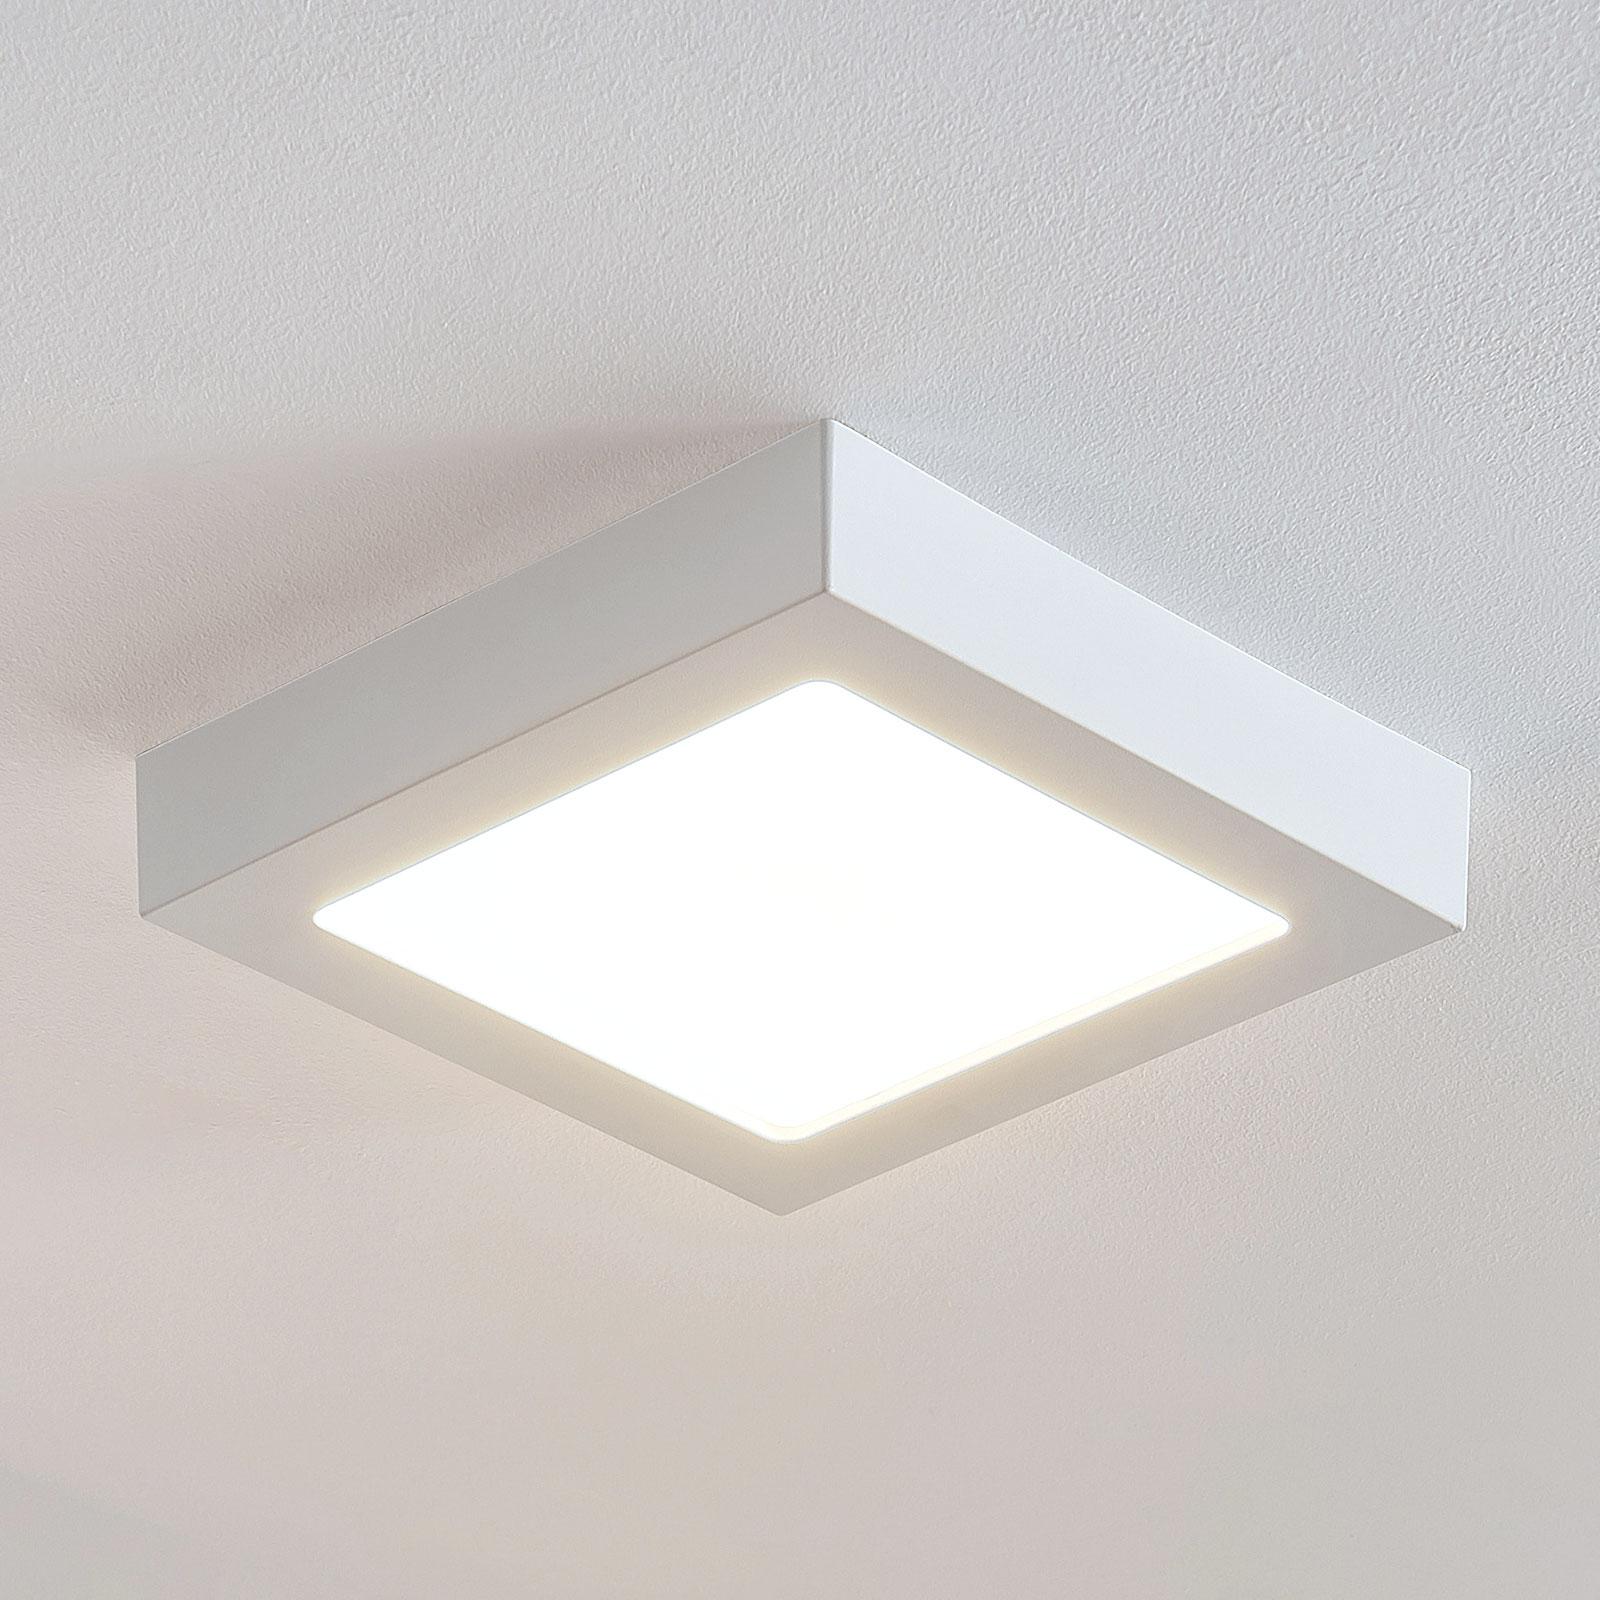 LED-taklampa Marlo vit 3000K kantig 23,1cm